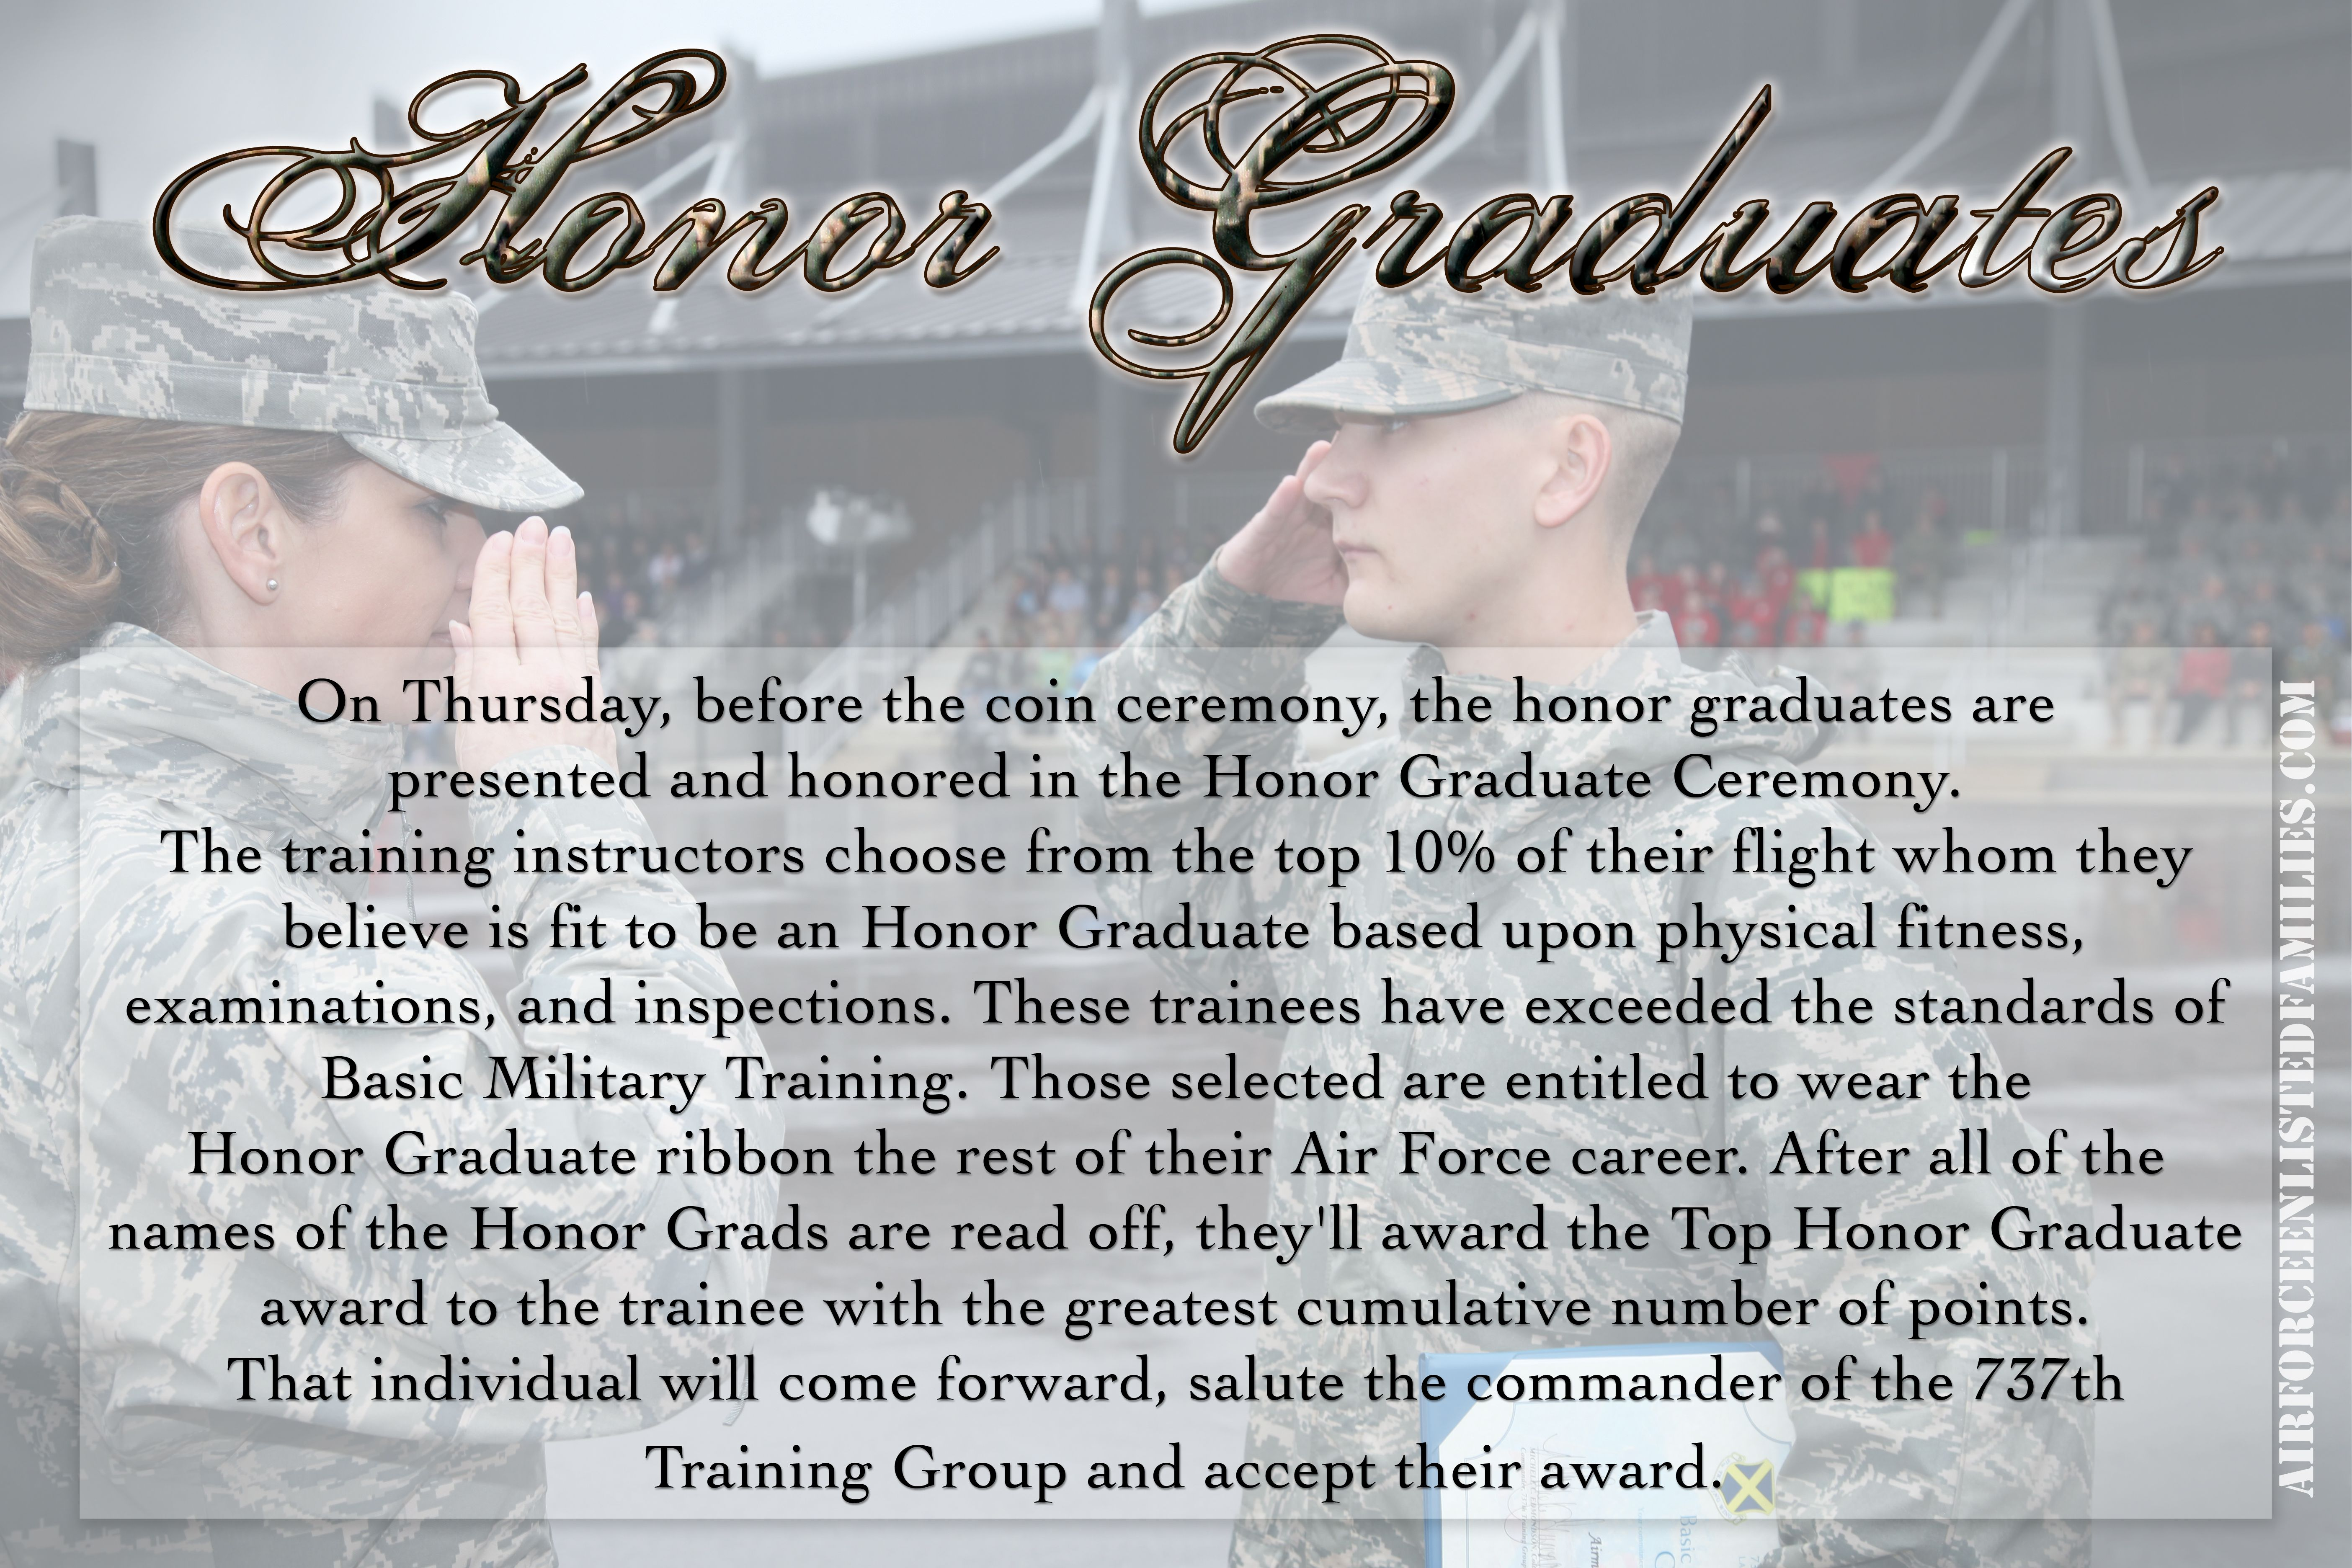 The Honor Graduate ceremony happens Thursday morning